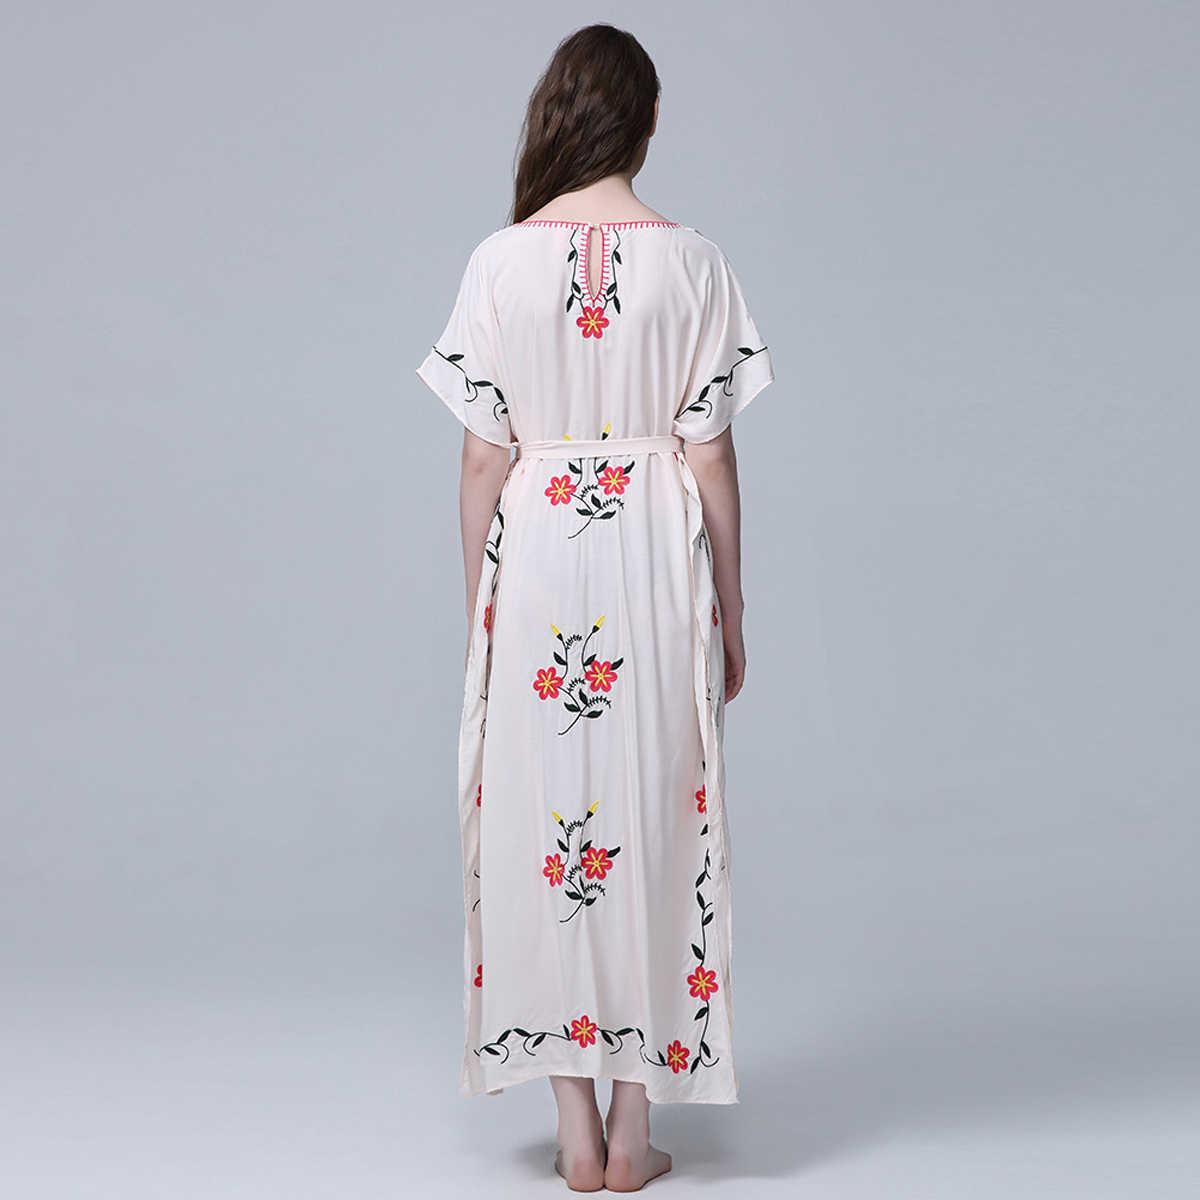 db3b50d5efe54 Jastie Boho Floral Embroidered Kaftan Women Dress V-Neck with Tassels  Summer Dress Oversized Batwing Sleeve Swimsuit Beach Dress